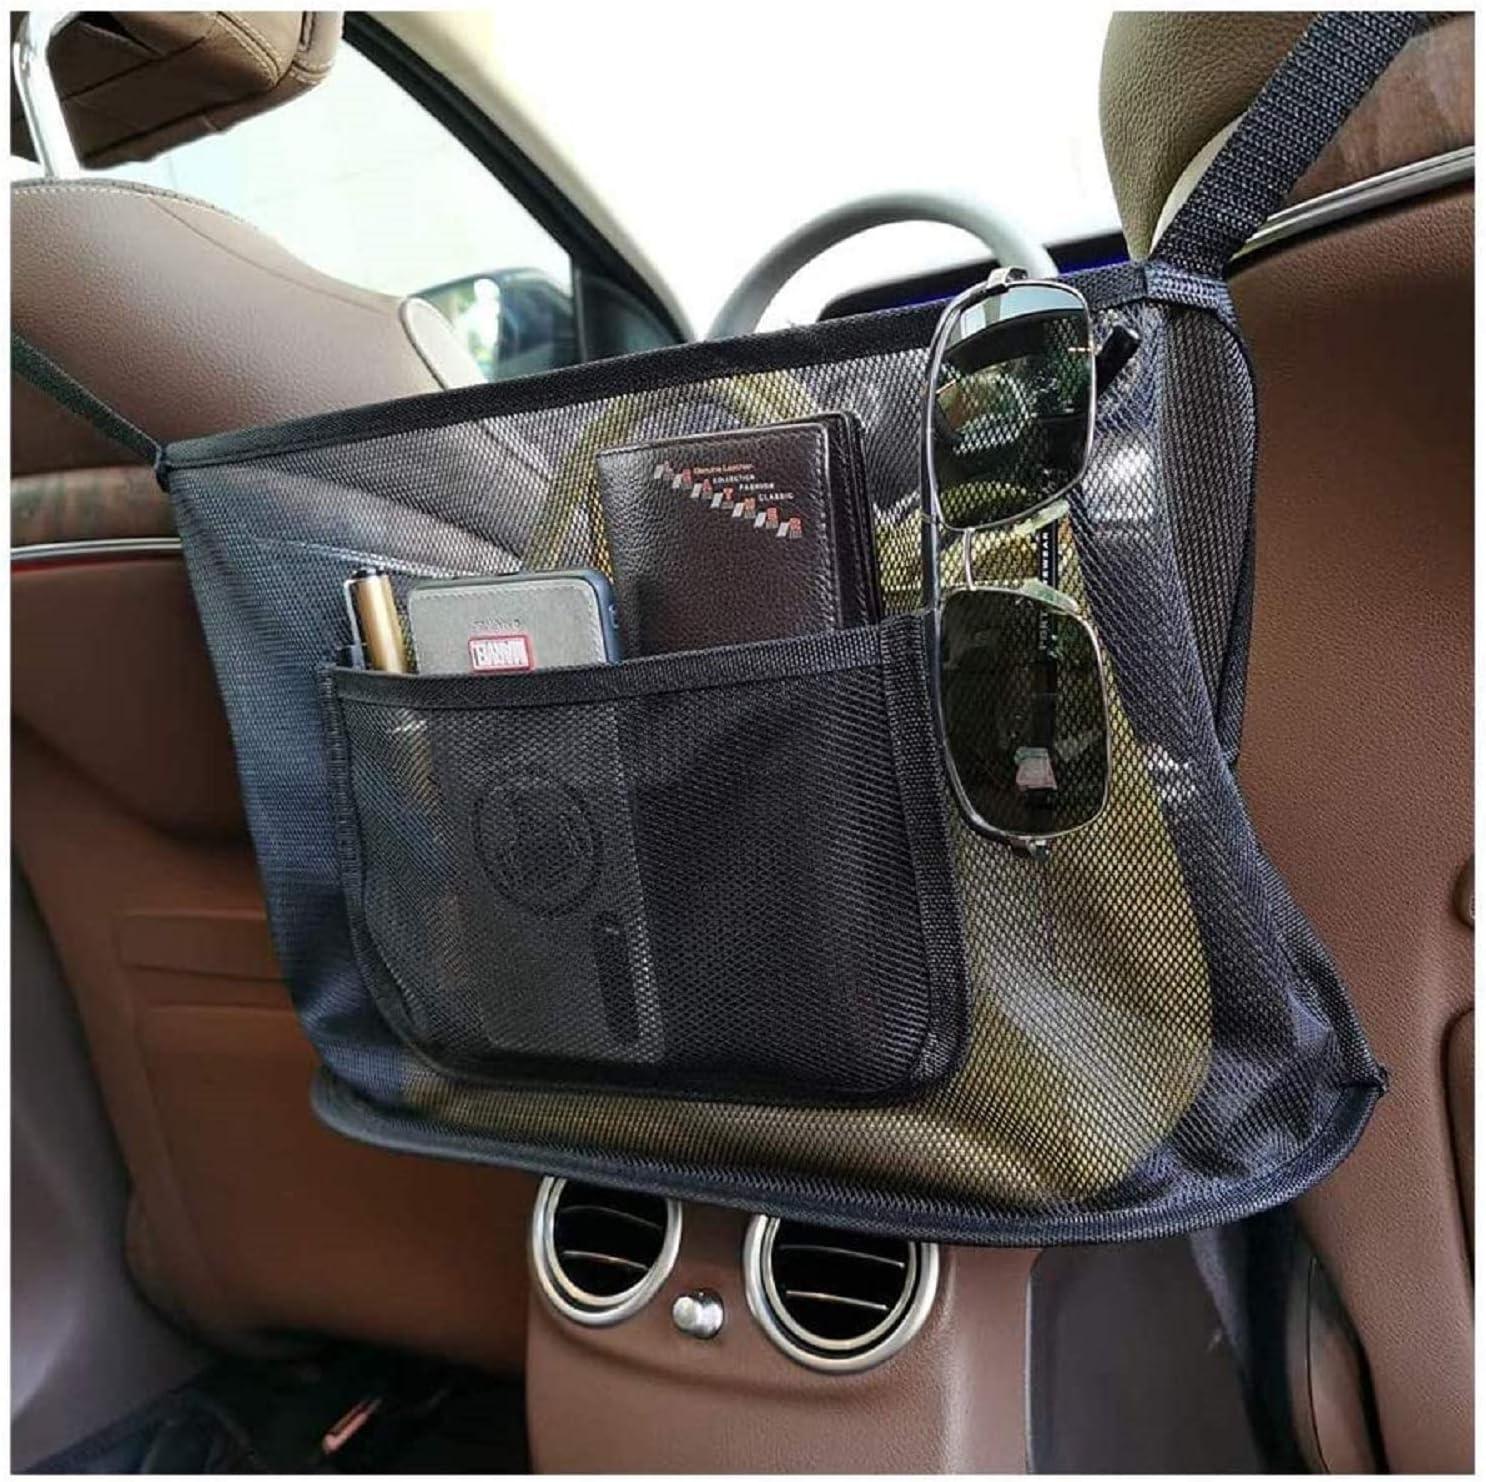 Car Net Pocket Handbag Holder Animer and price quality assurance revision Backseat Seat Rear P Organizer